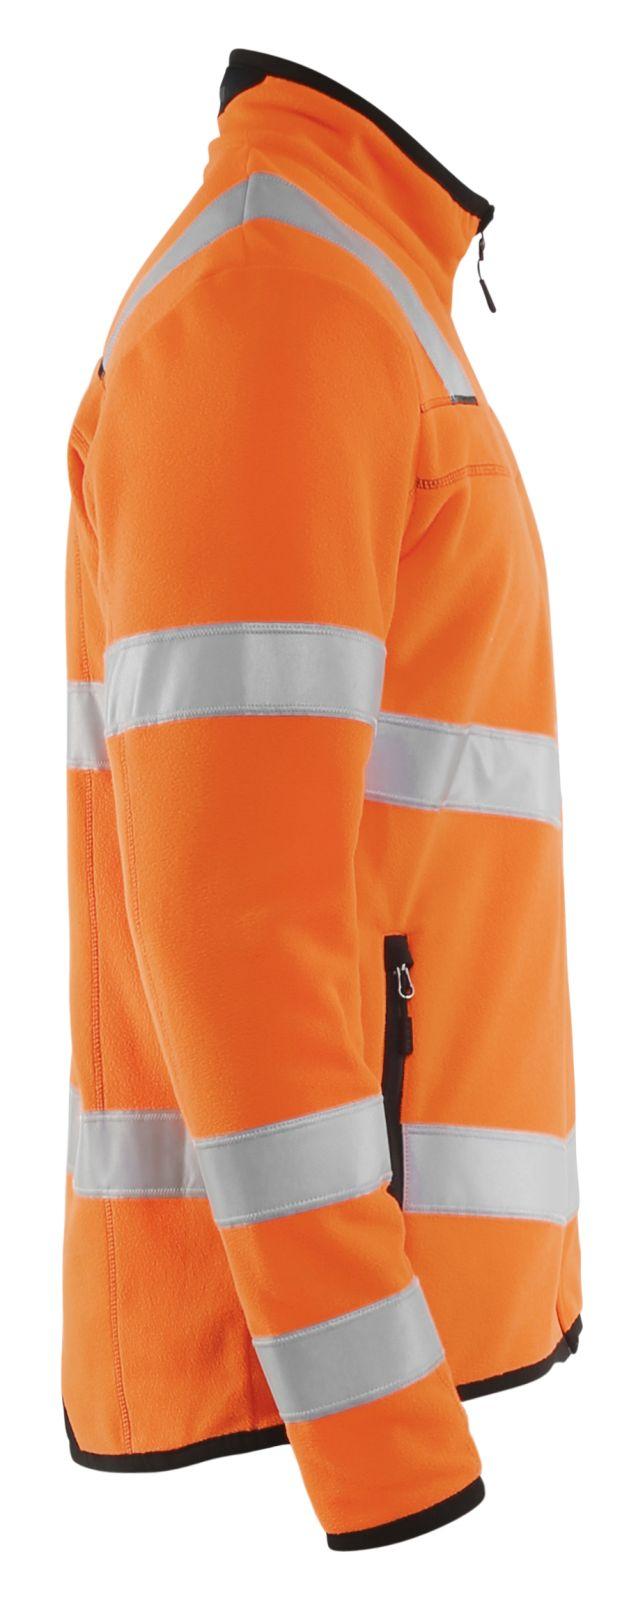 Blaklader Fleece vesten 49411010 High Vis oranje(5300)